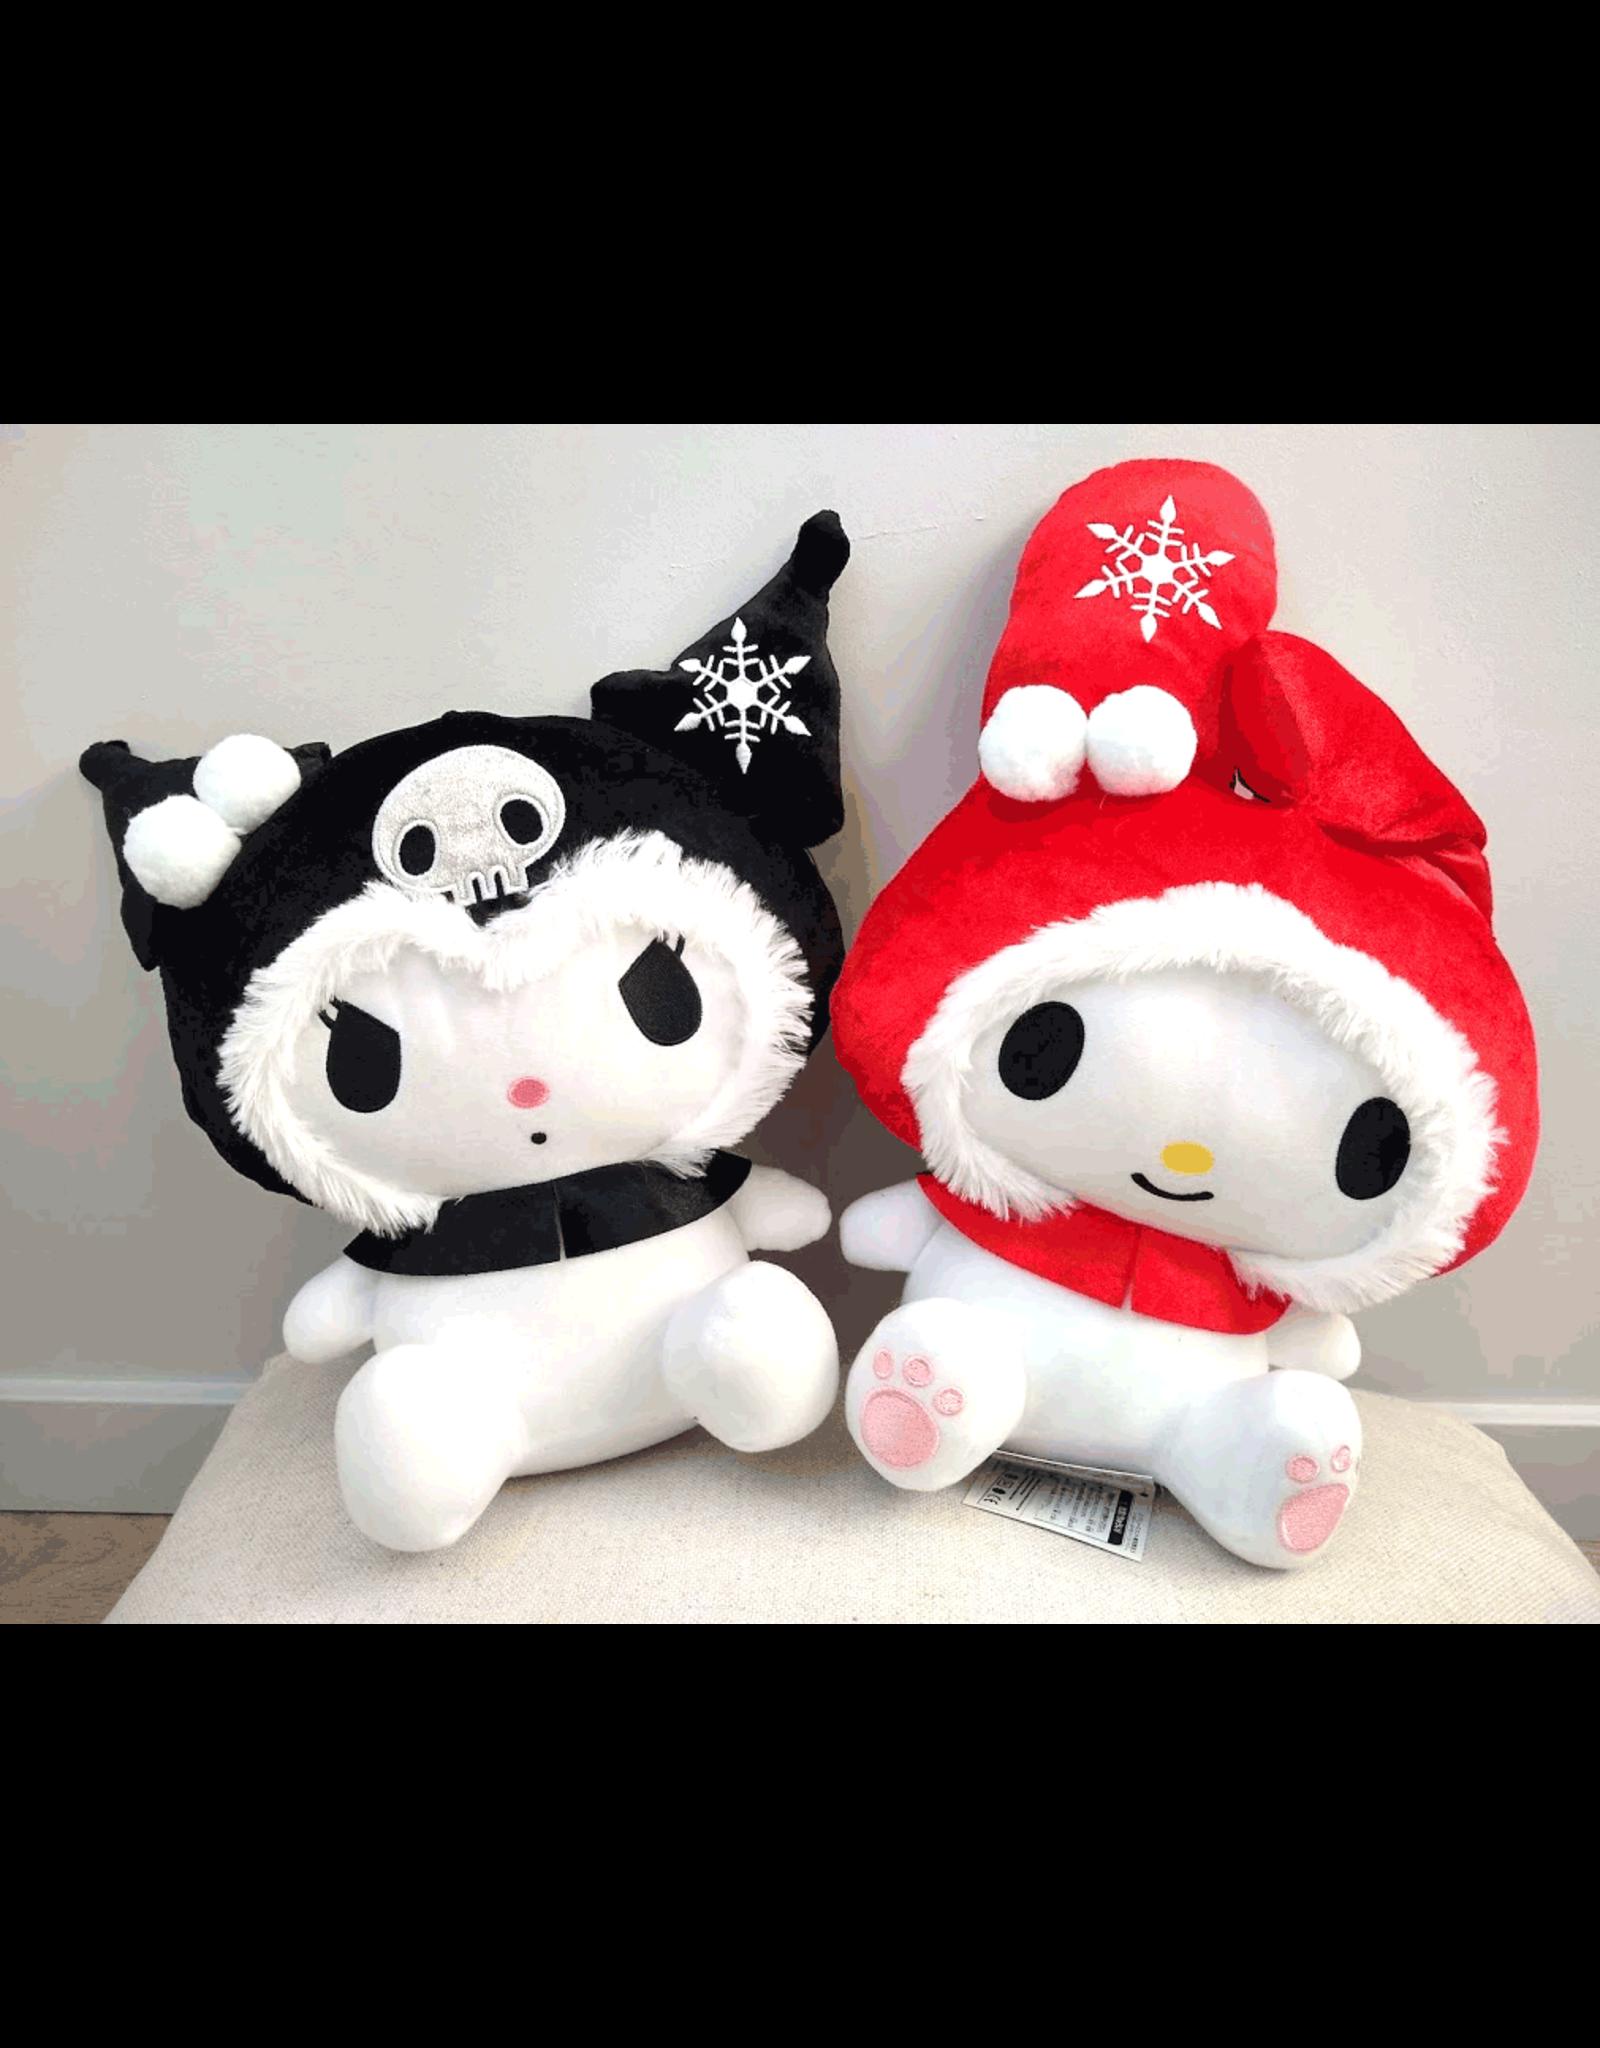 Sanrio Kuromi Winter Big plush - 40cm